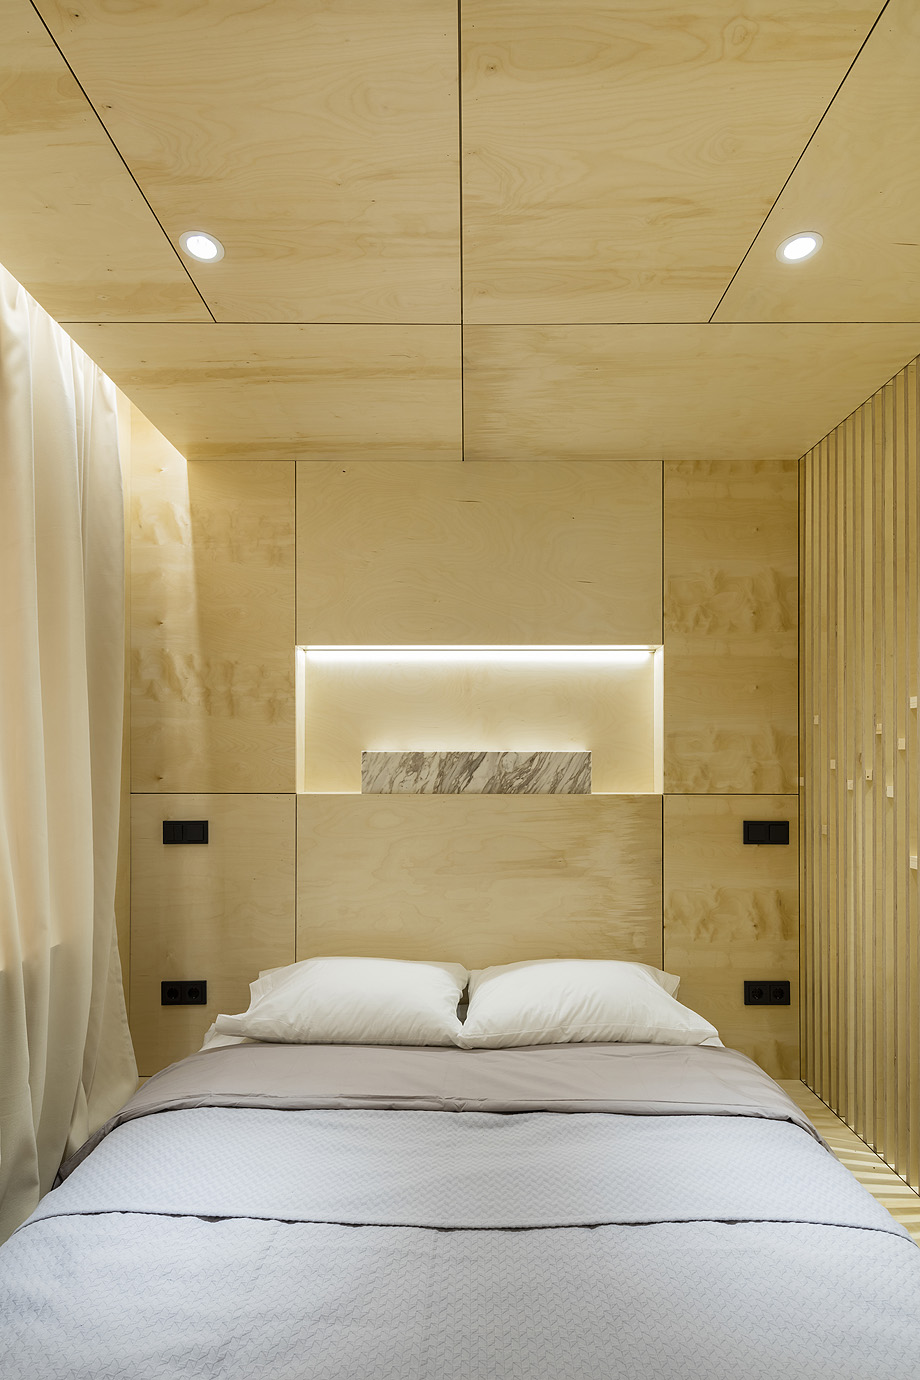 apartamento de monoloko design - foto dmitry chebanenko (11)